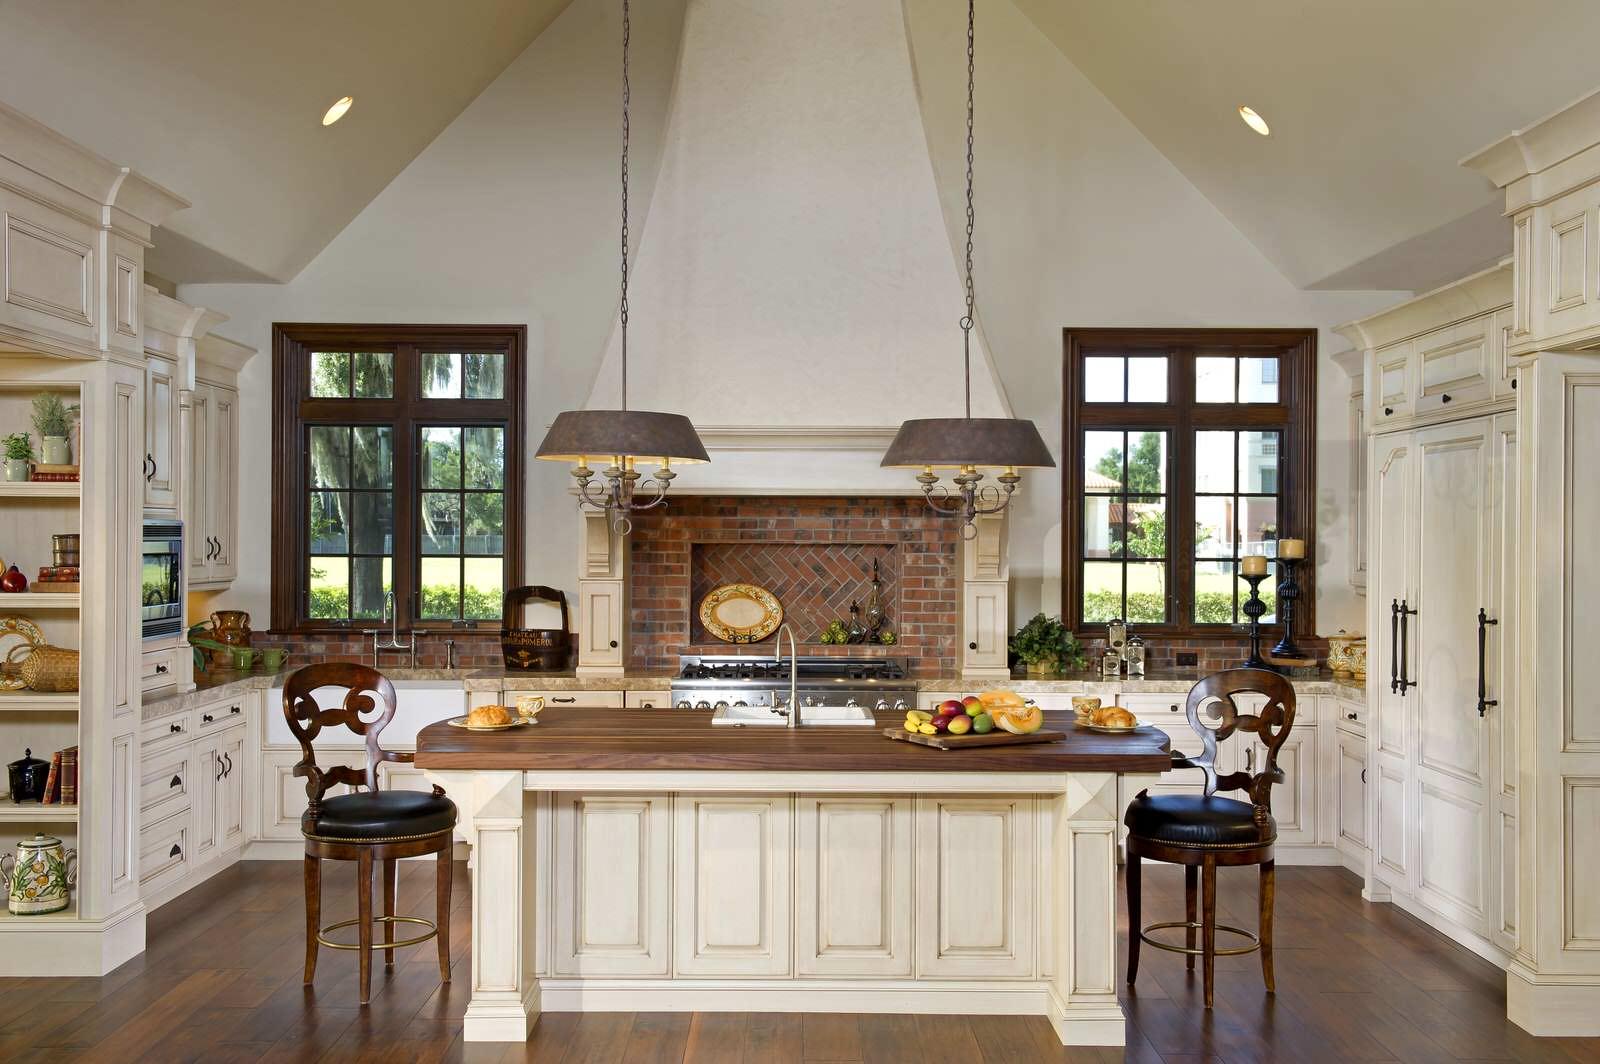 17 Most Fabulous Cream Kitchen Cabinets Designs You Must Know Jimenezphoto